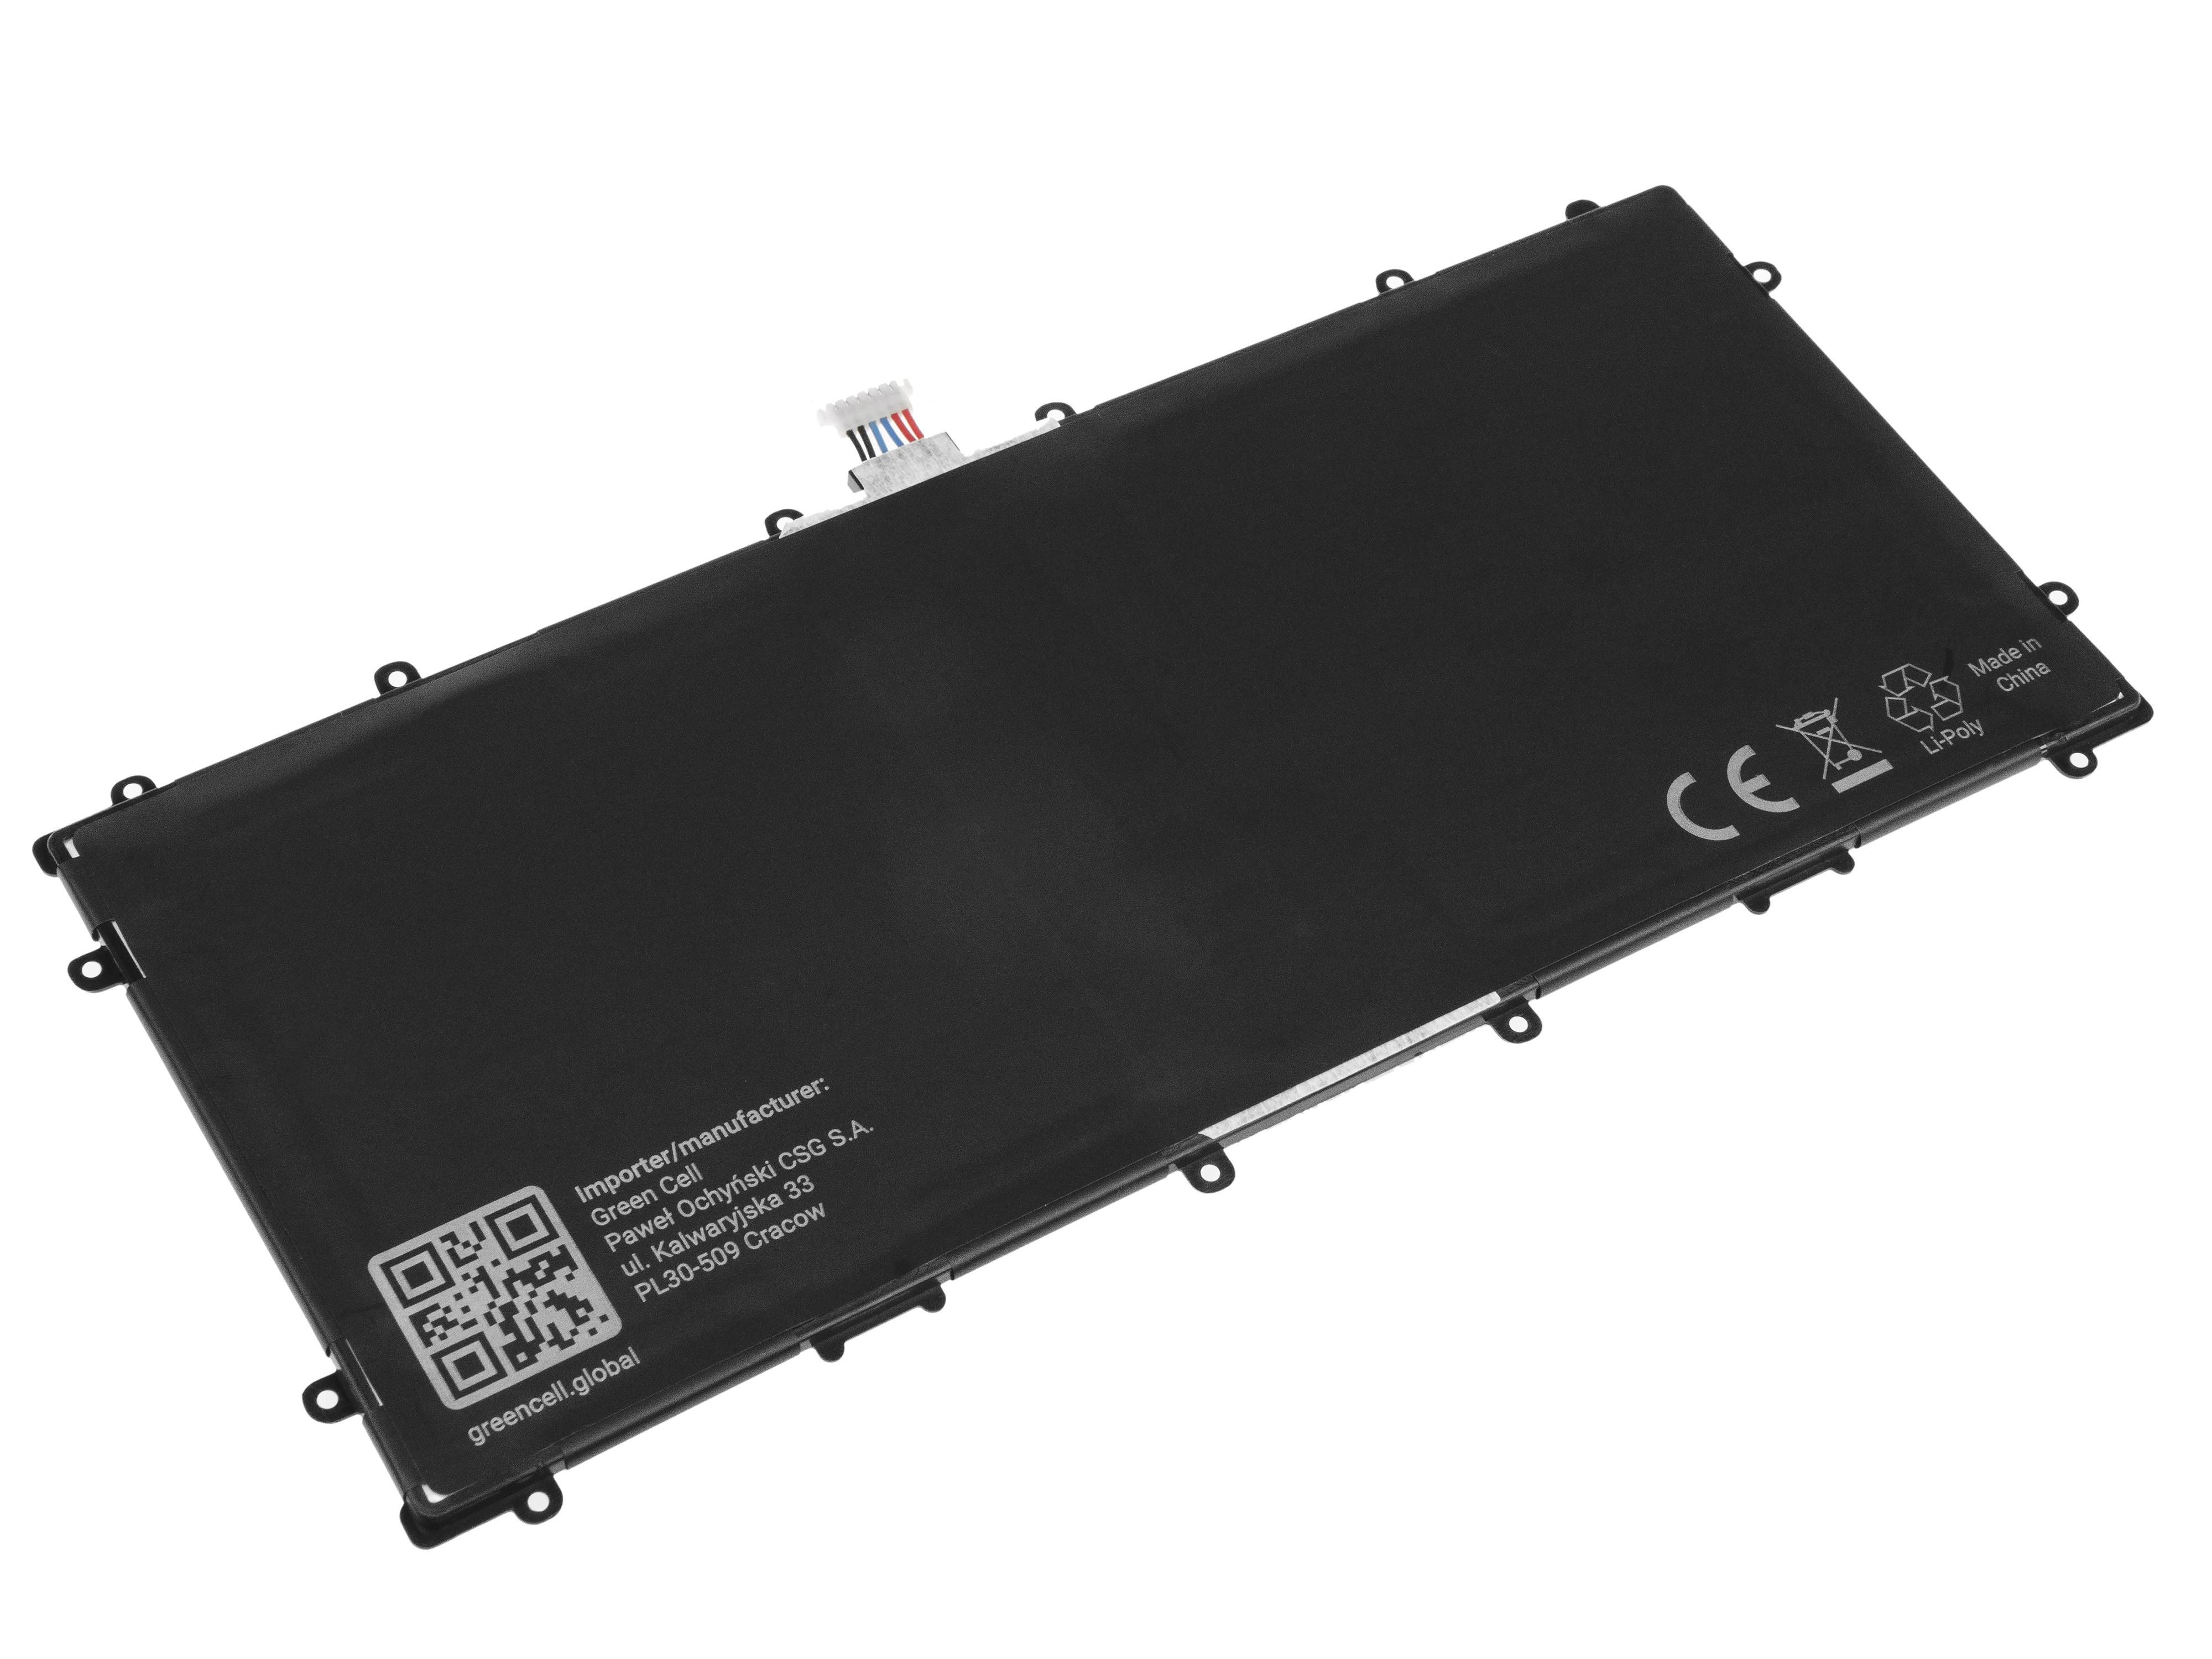 Green Cell TAB41 Baterie Samsung SP3496A8H(1S2P) pro Samsung Google Nexus 10 P8110 8000mAh Li-Pol – neoriginální